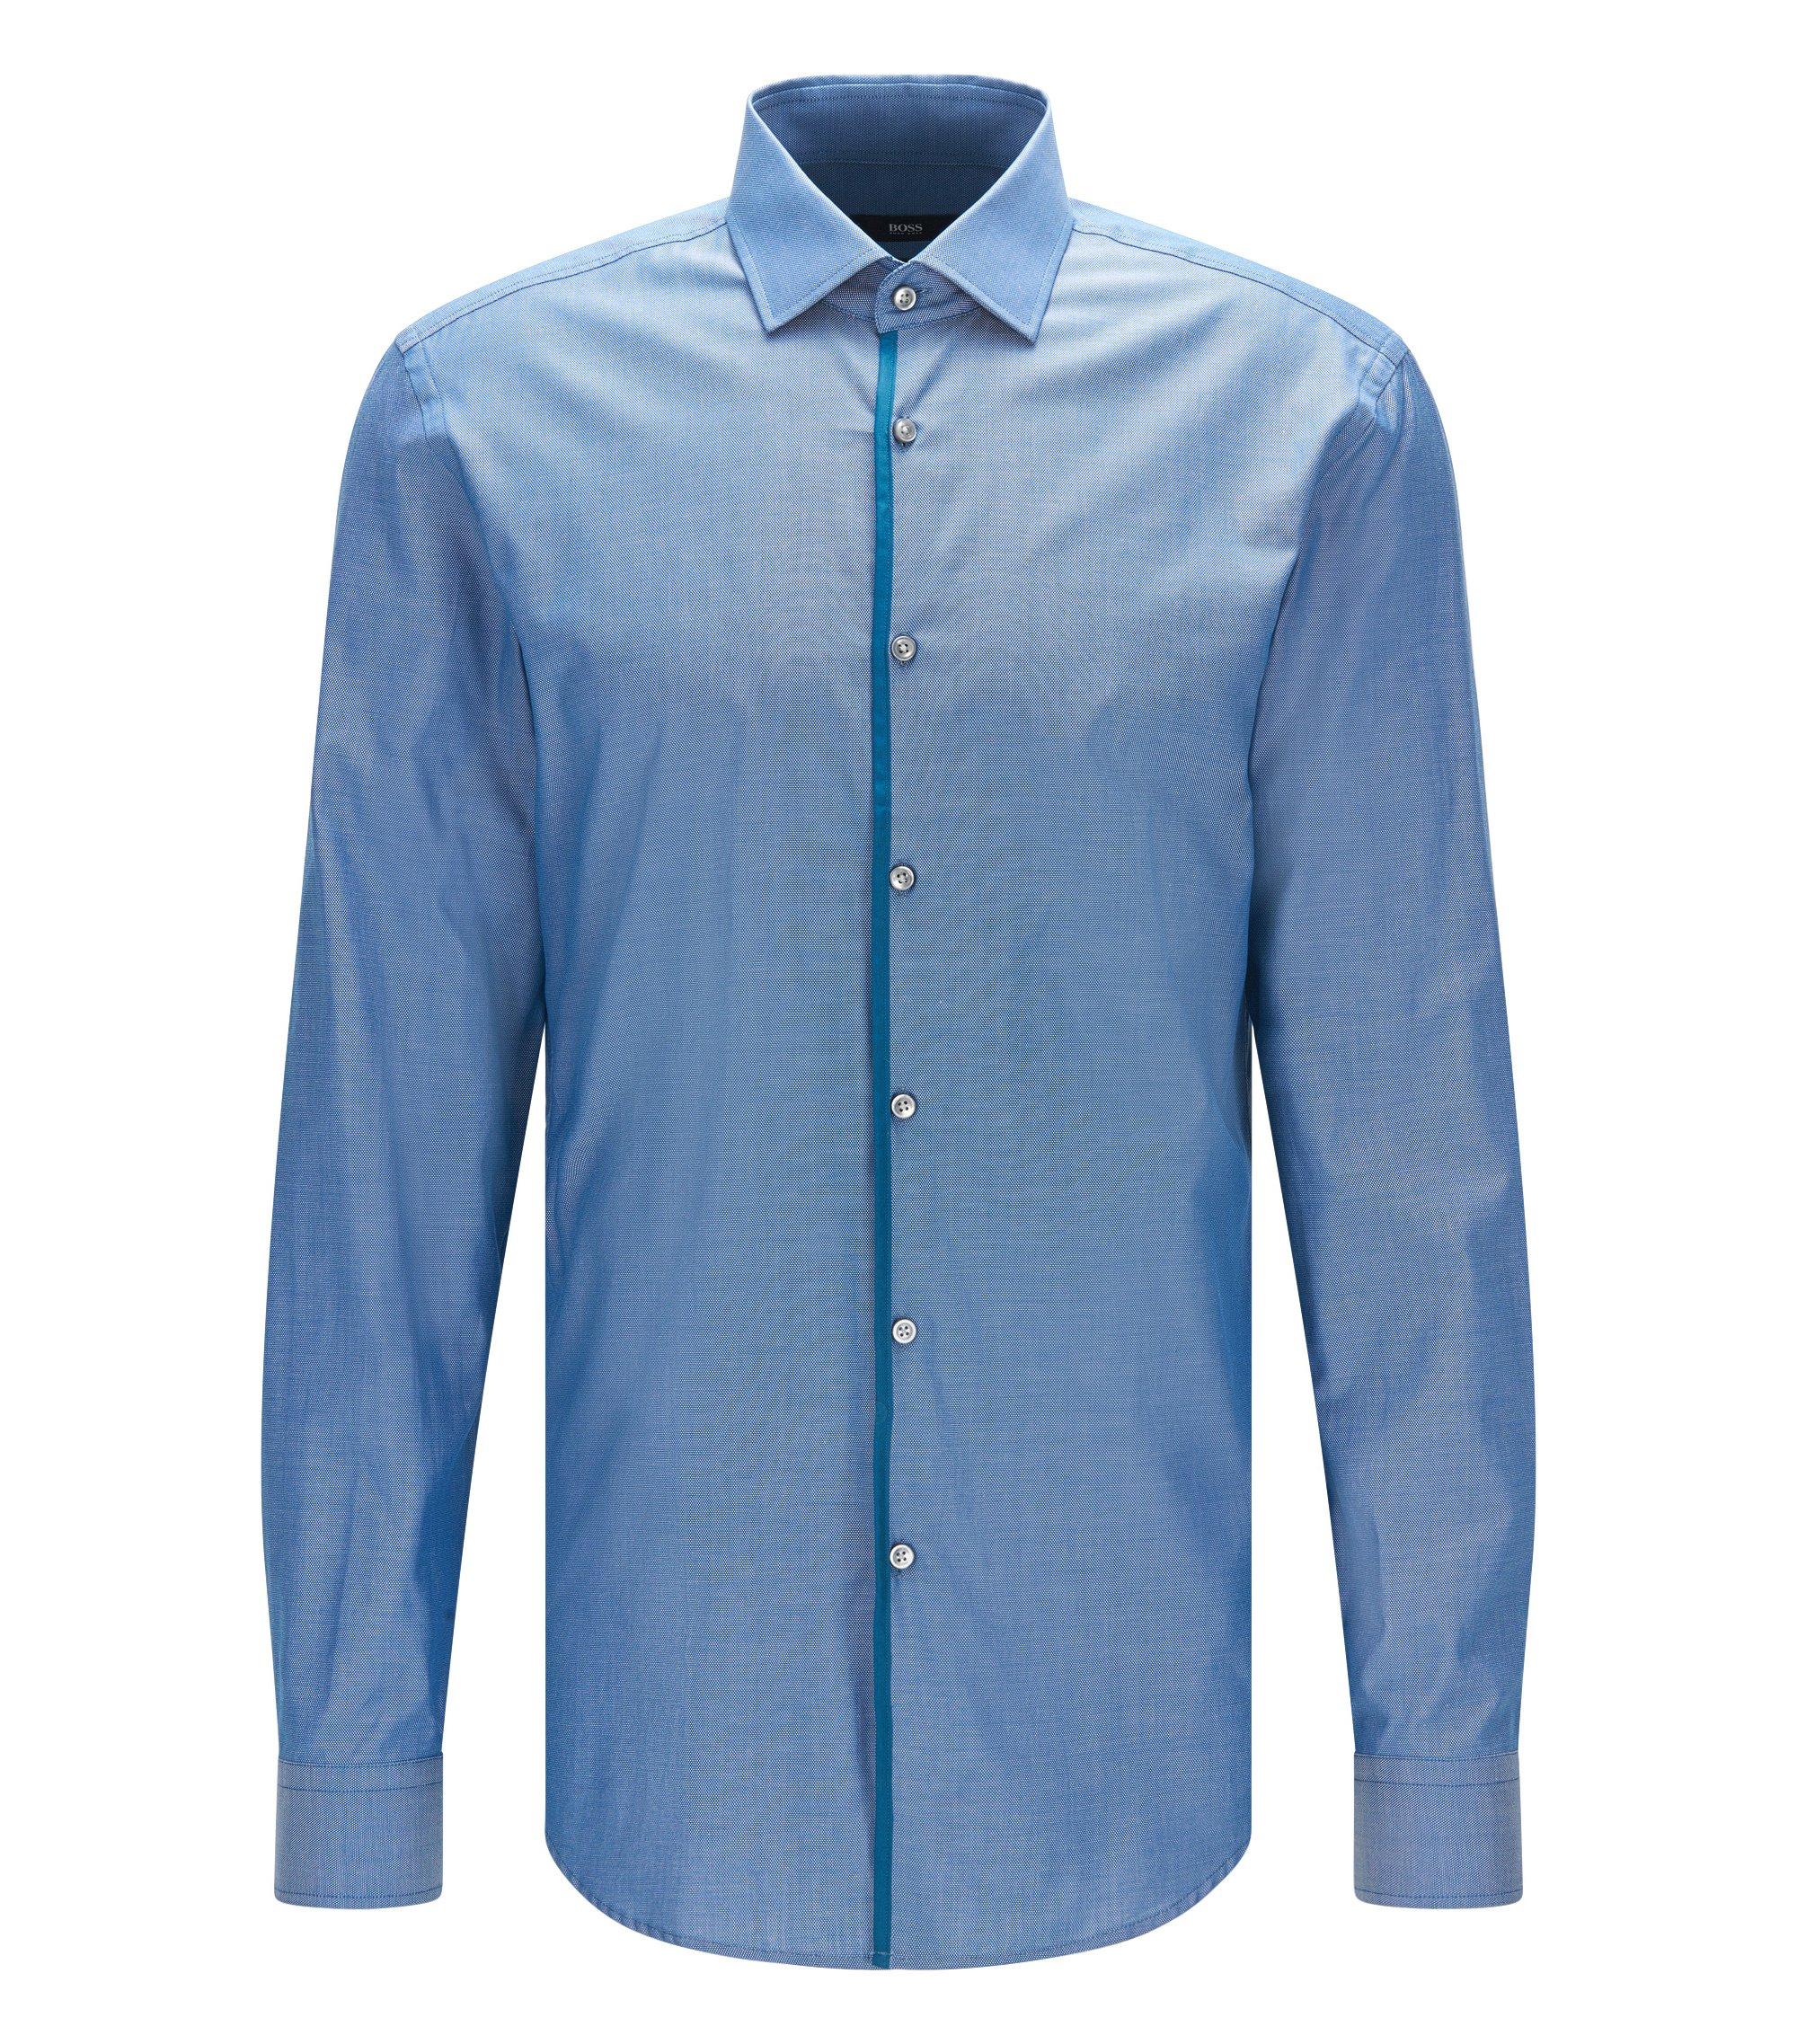 Royal Oxford Cotton Dress Shirt, Slim Fit | Jeldrik, Turquoise